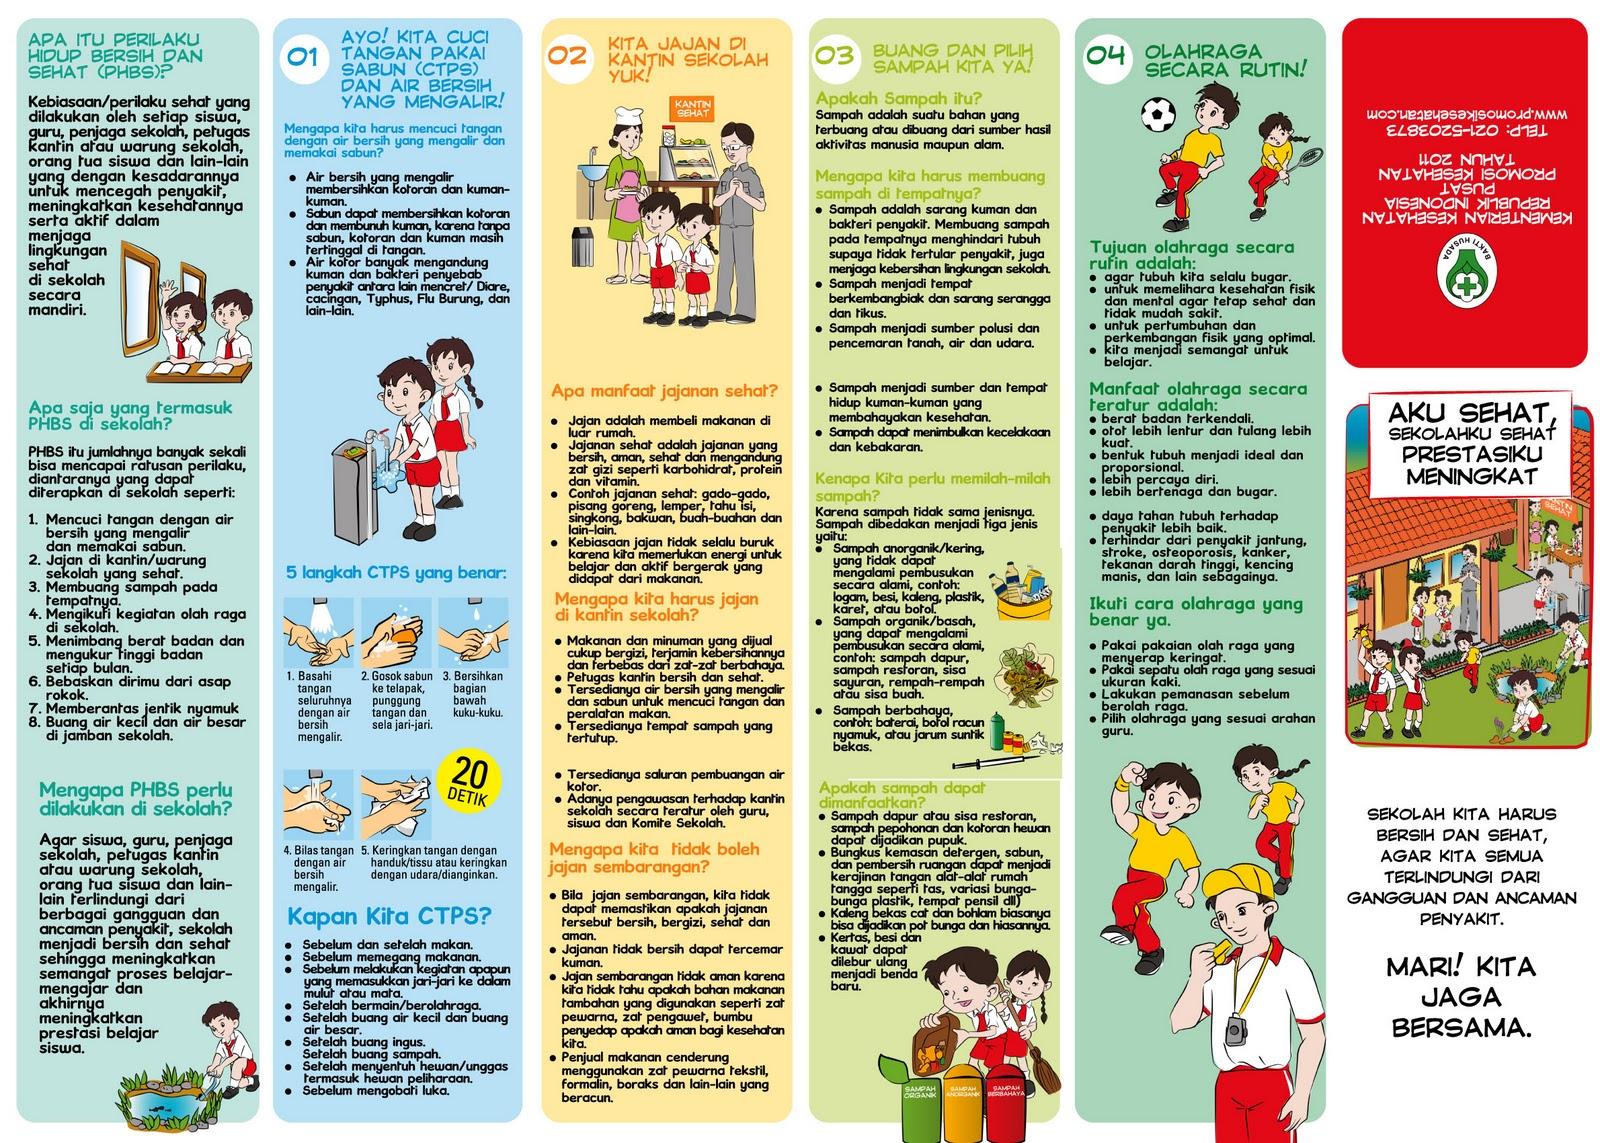 UGI(Untuk_Gizi_Indonesia): PHBS Sekolah